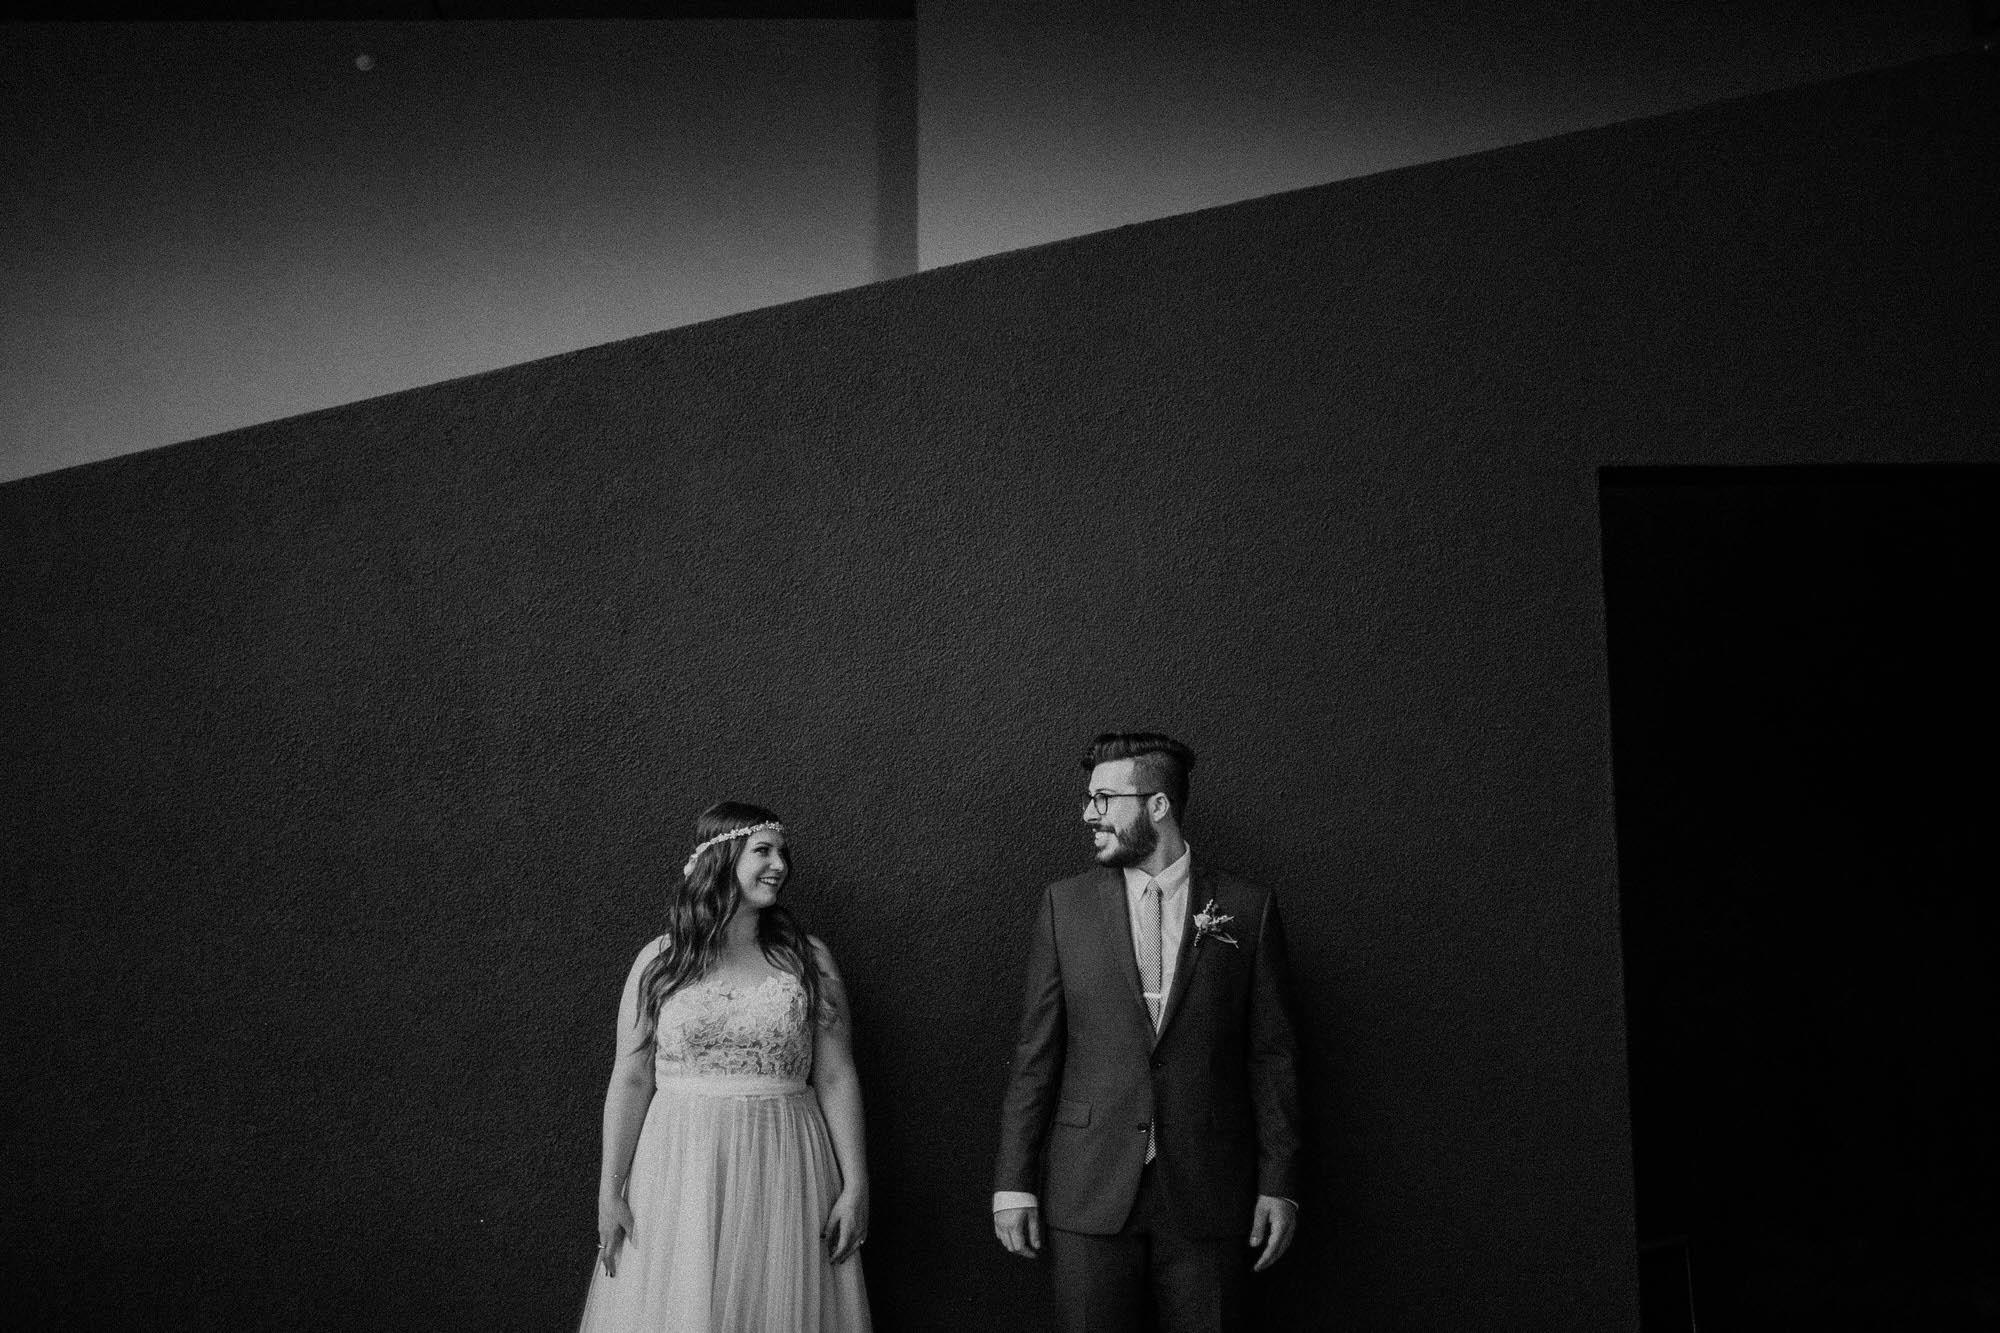 los-angeles-wedding-photographer-kristen-dylan-41.jpg